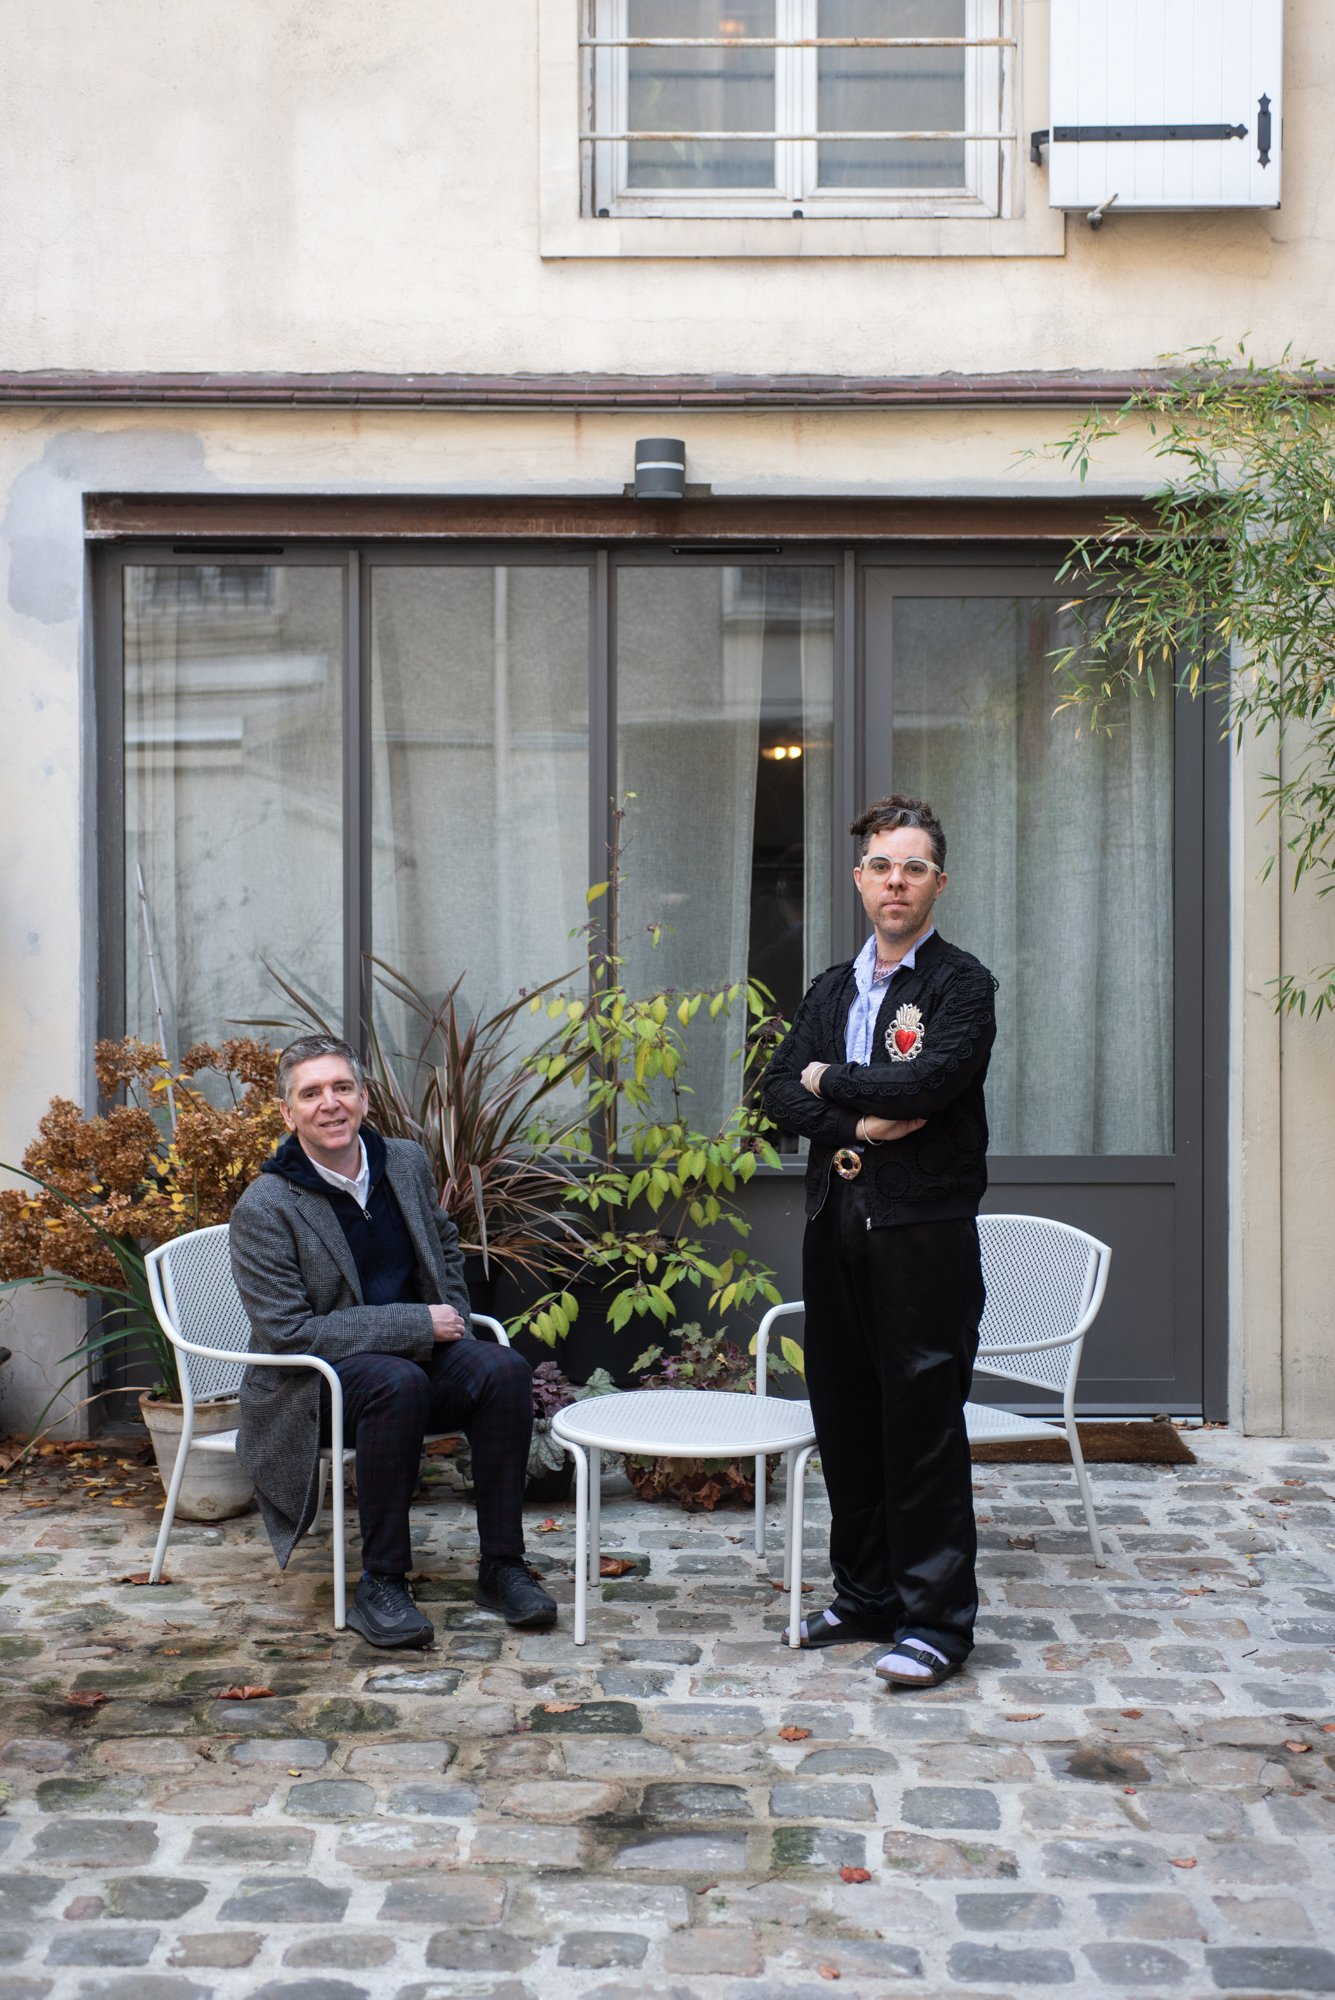 Mériadek Caraës et Olivier Lujan-Casas